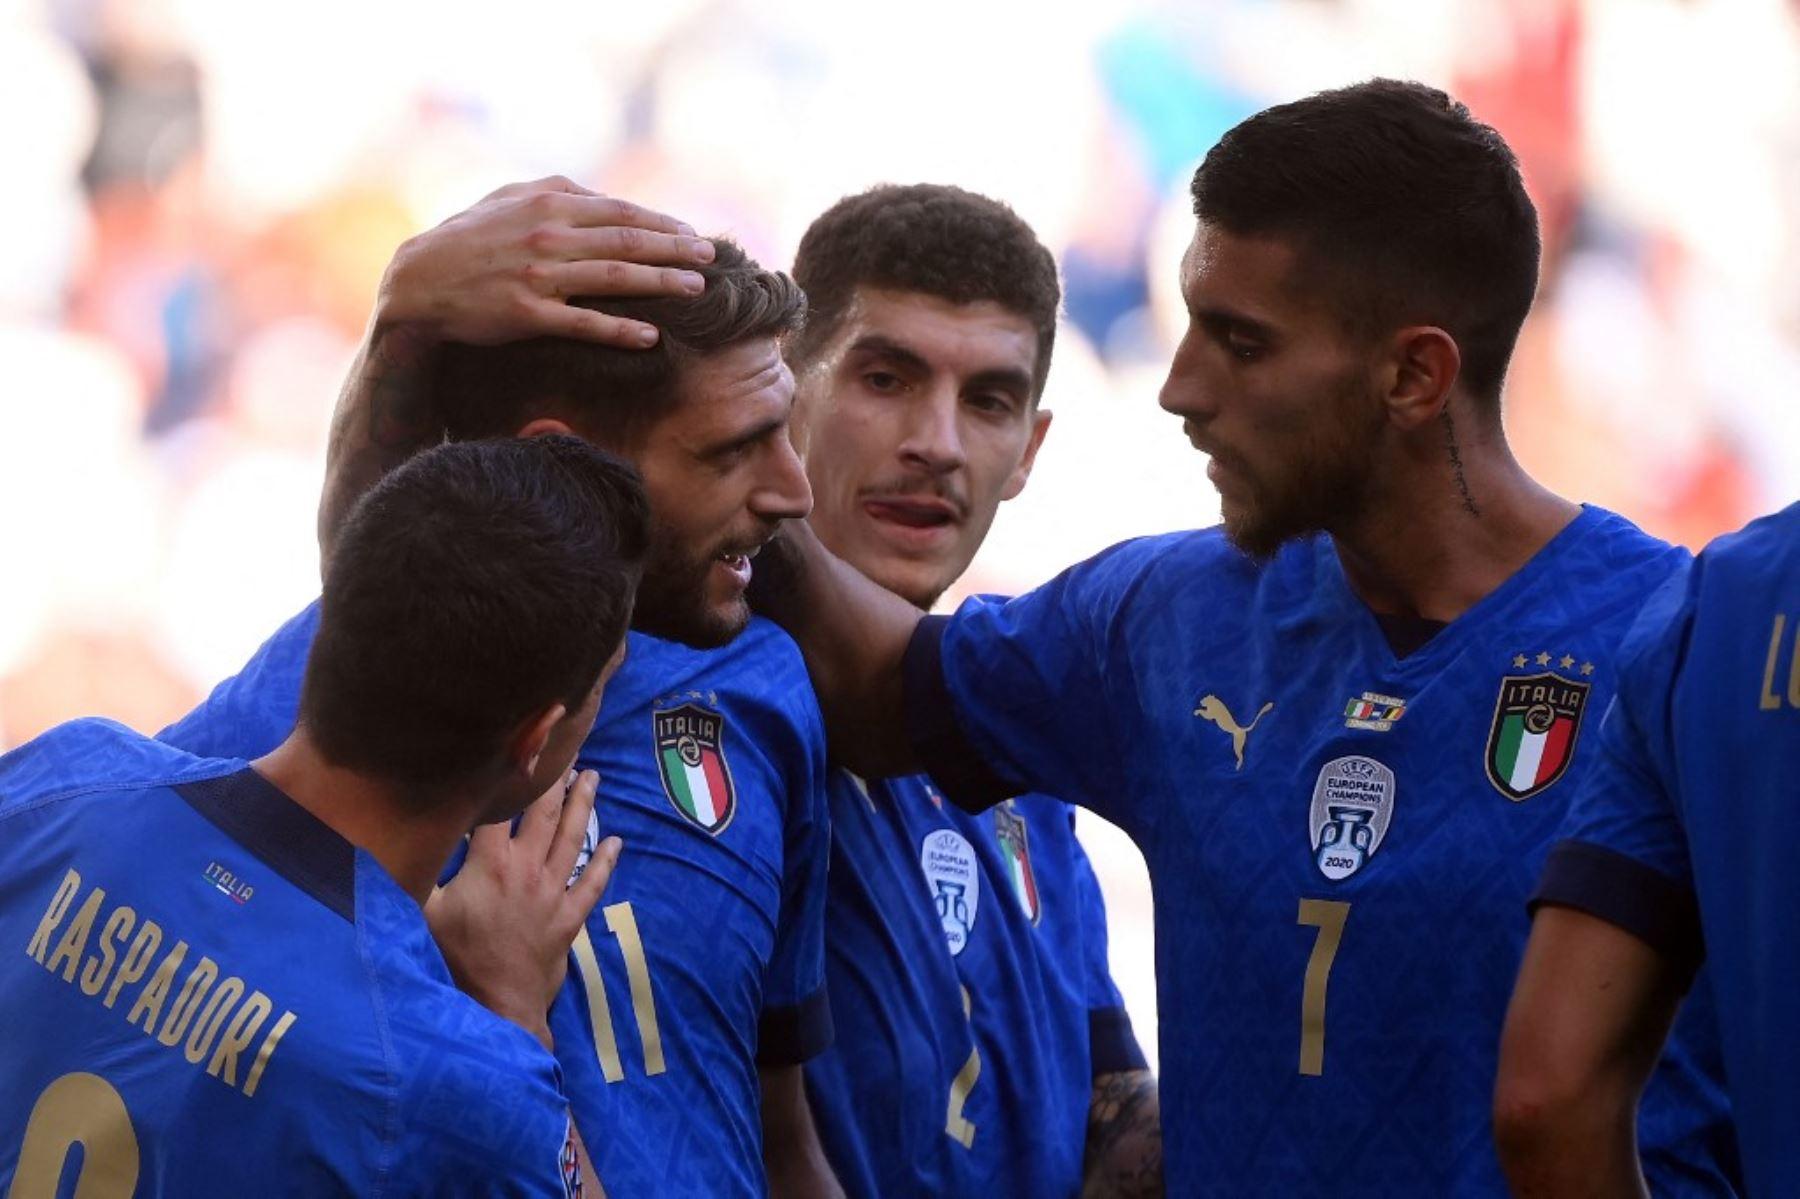 Italia gana 2-1 a Bélgica y logra la tercera plaza de la Liga de Naciones